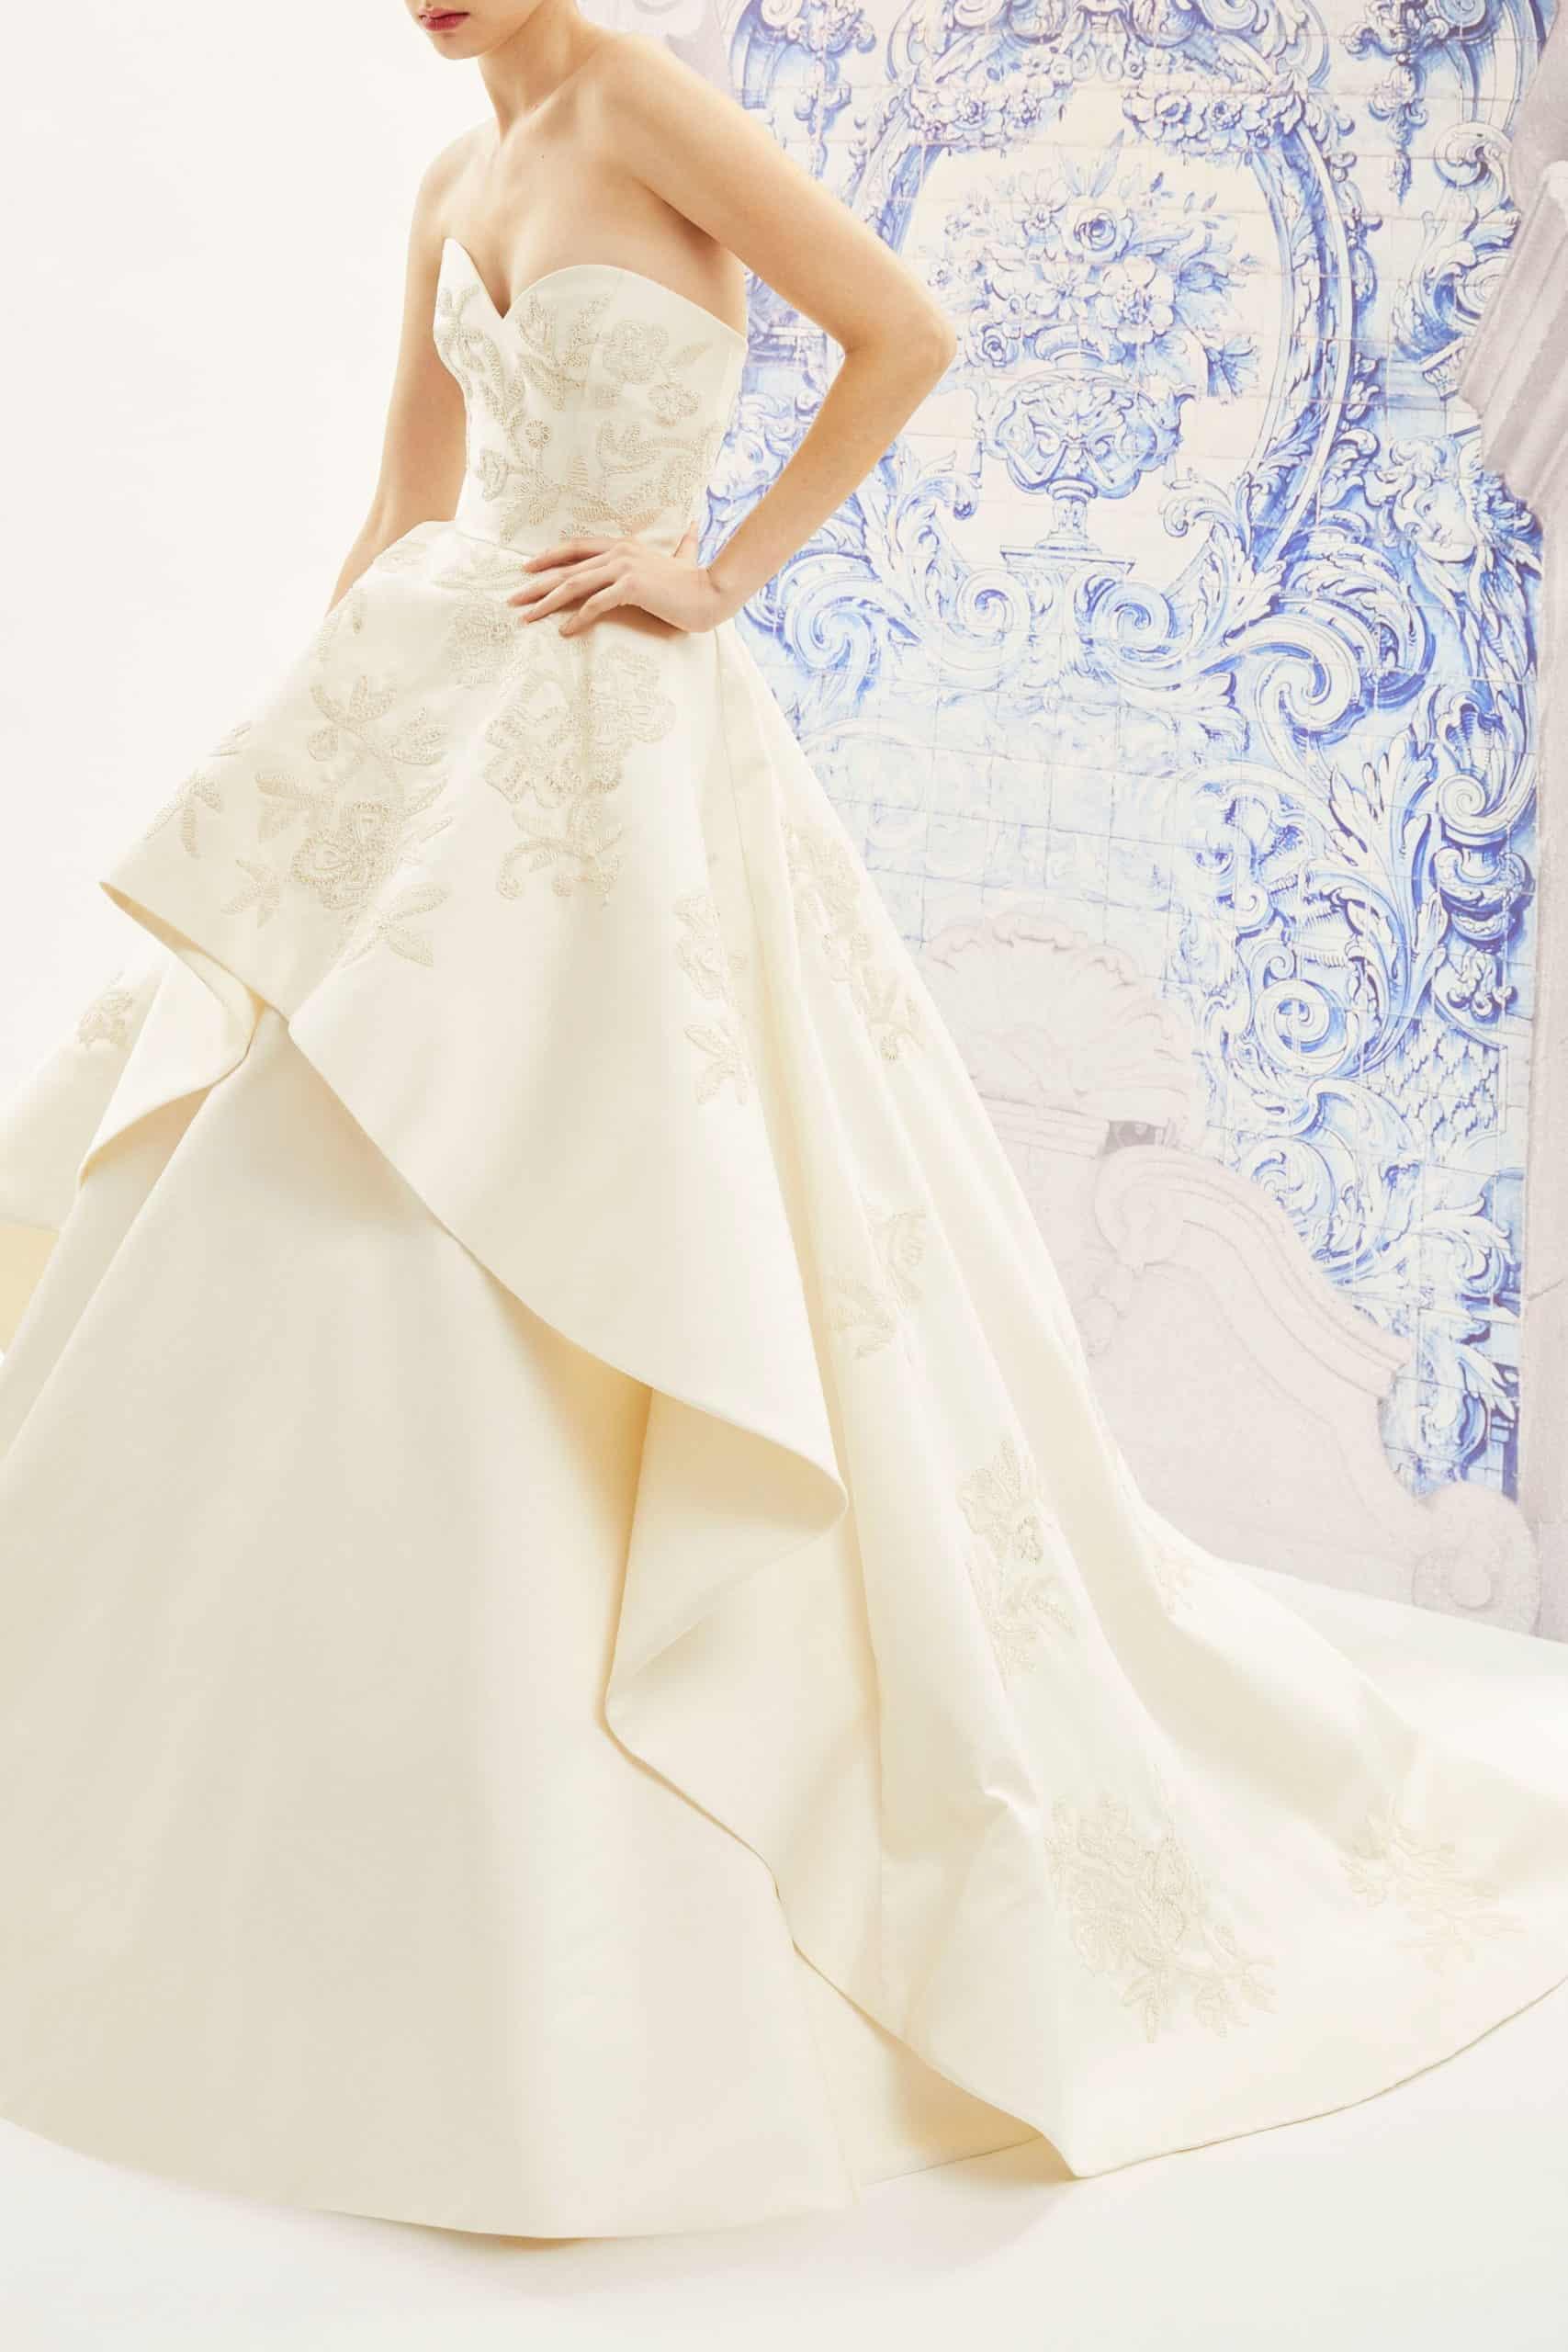 wedding dress with a extra -volume skirt fall 2019 by Carolina Herrera